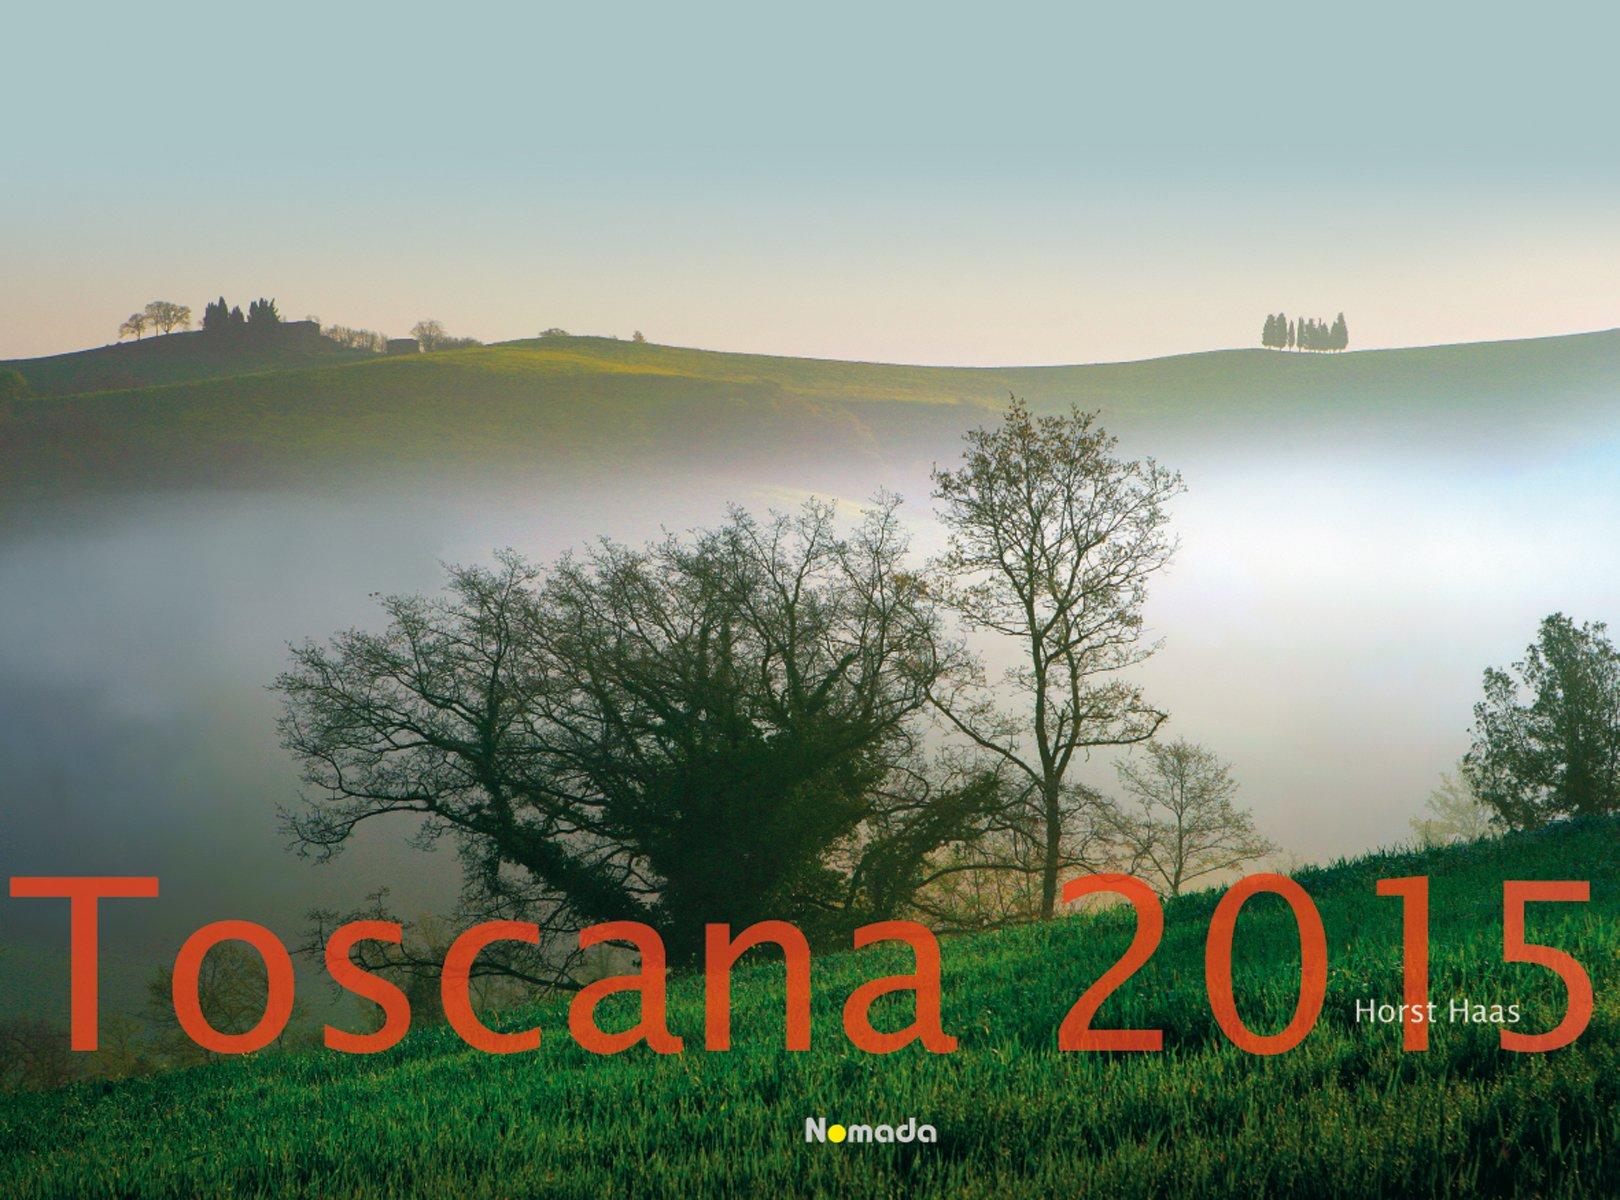 Toscana 2015 - Spanien - Bildkalender quer (56 x 42) - Nomada Landschaftskalender - by Horst Haas